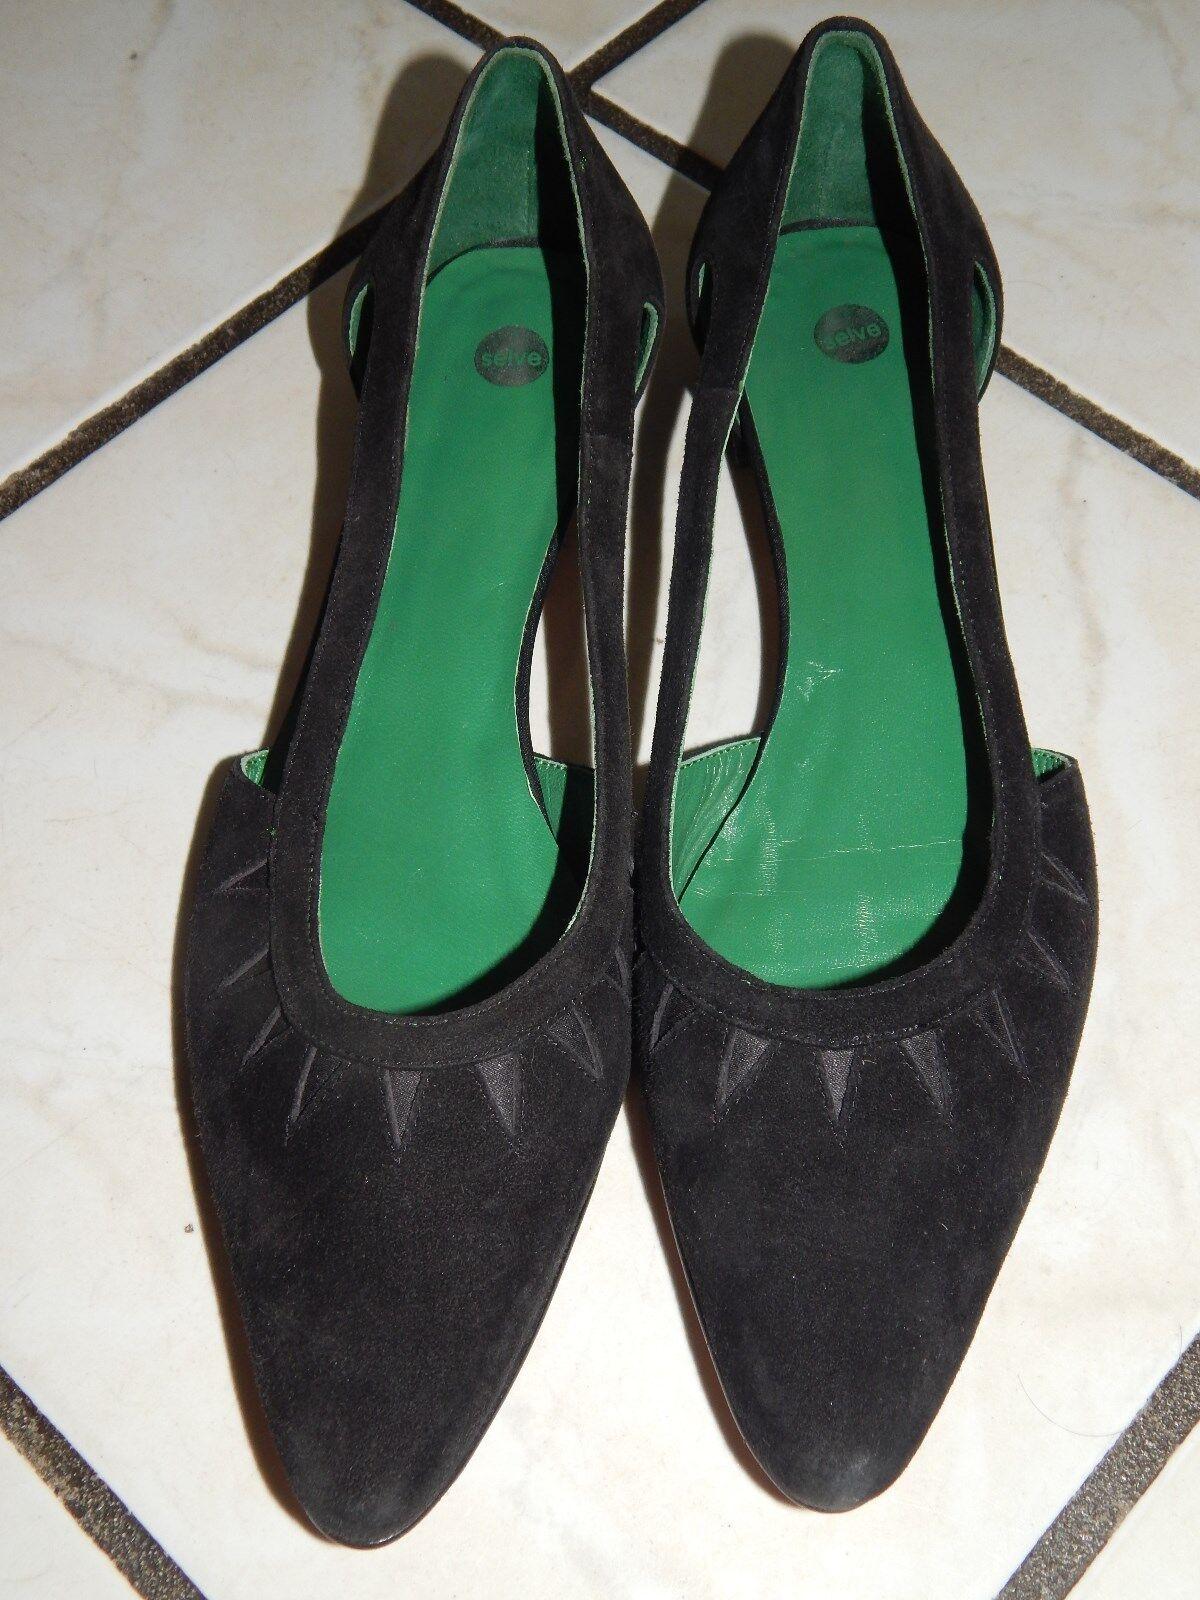 SELVE Loafers Mokassins Halbschuhe Ballerinas Handmade Gr. 38,5 Echt Leder (1)